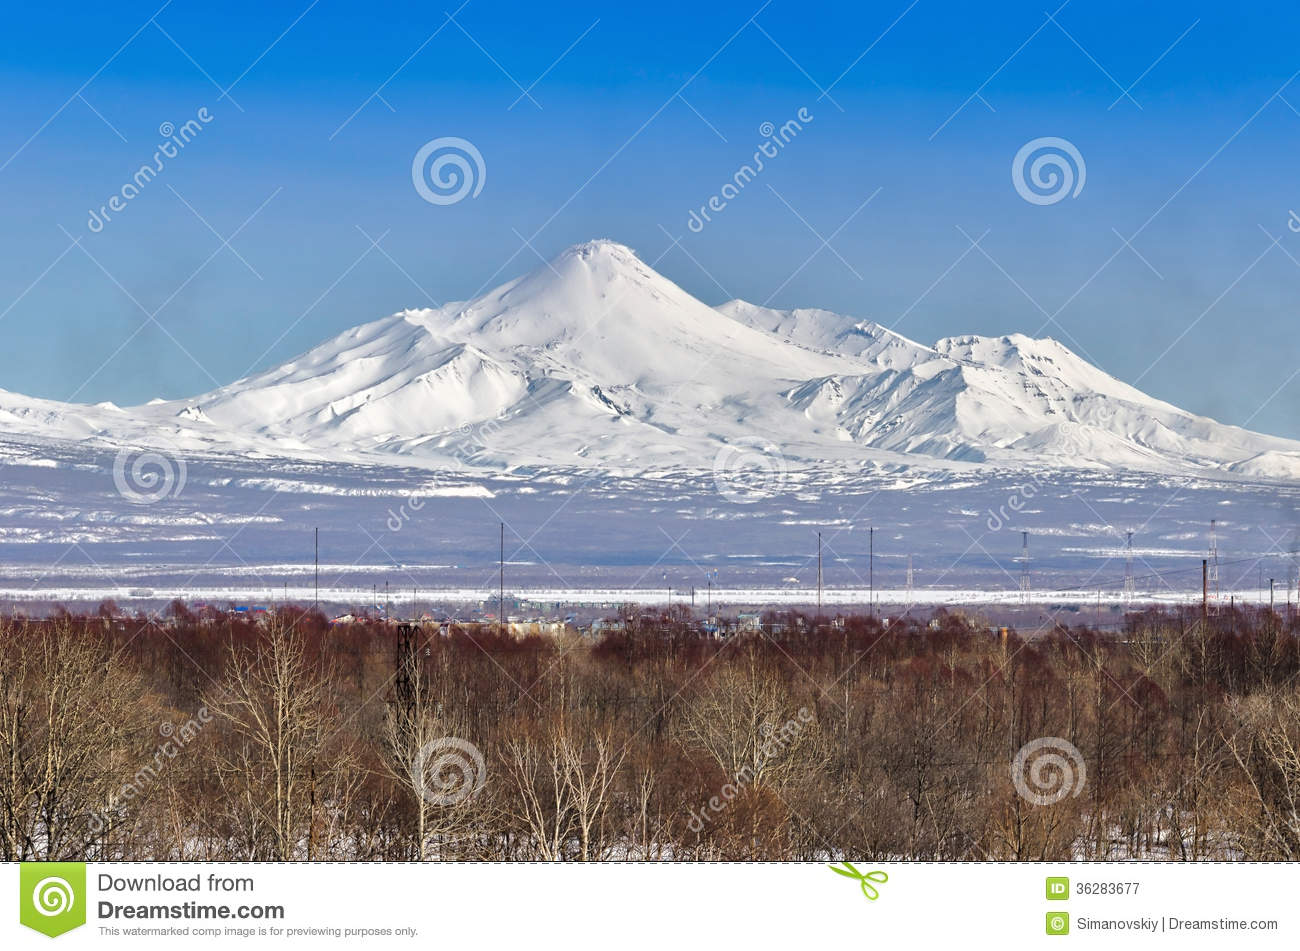 Kamchatka Peninsula clipart #8, Download drawings